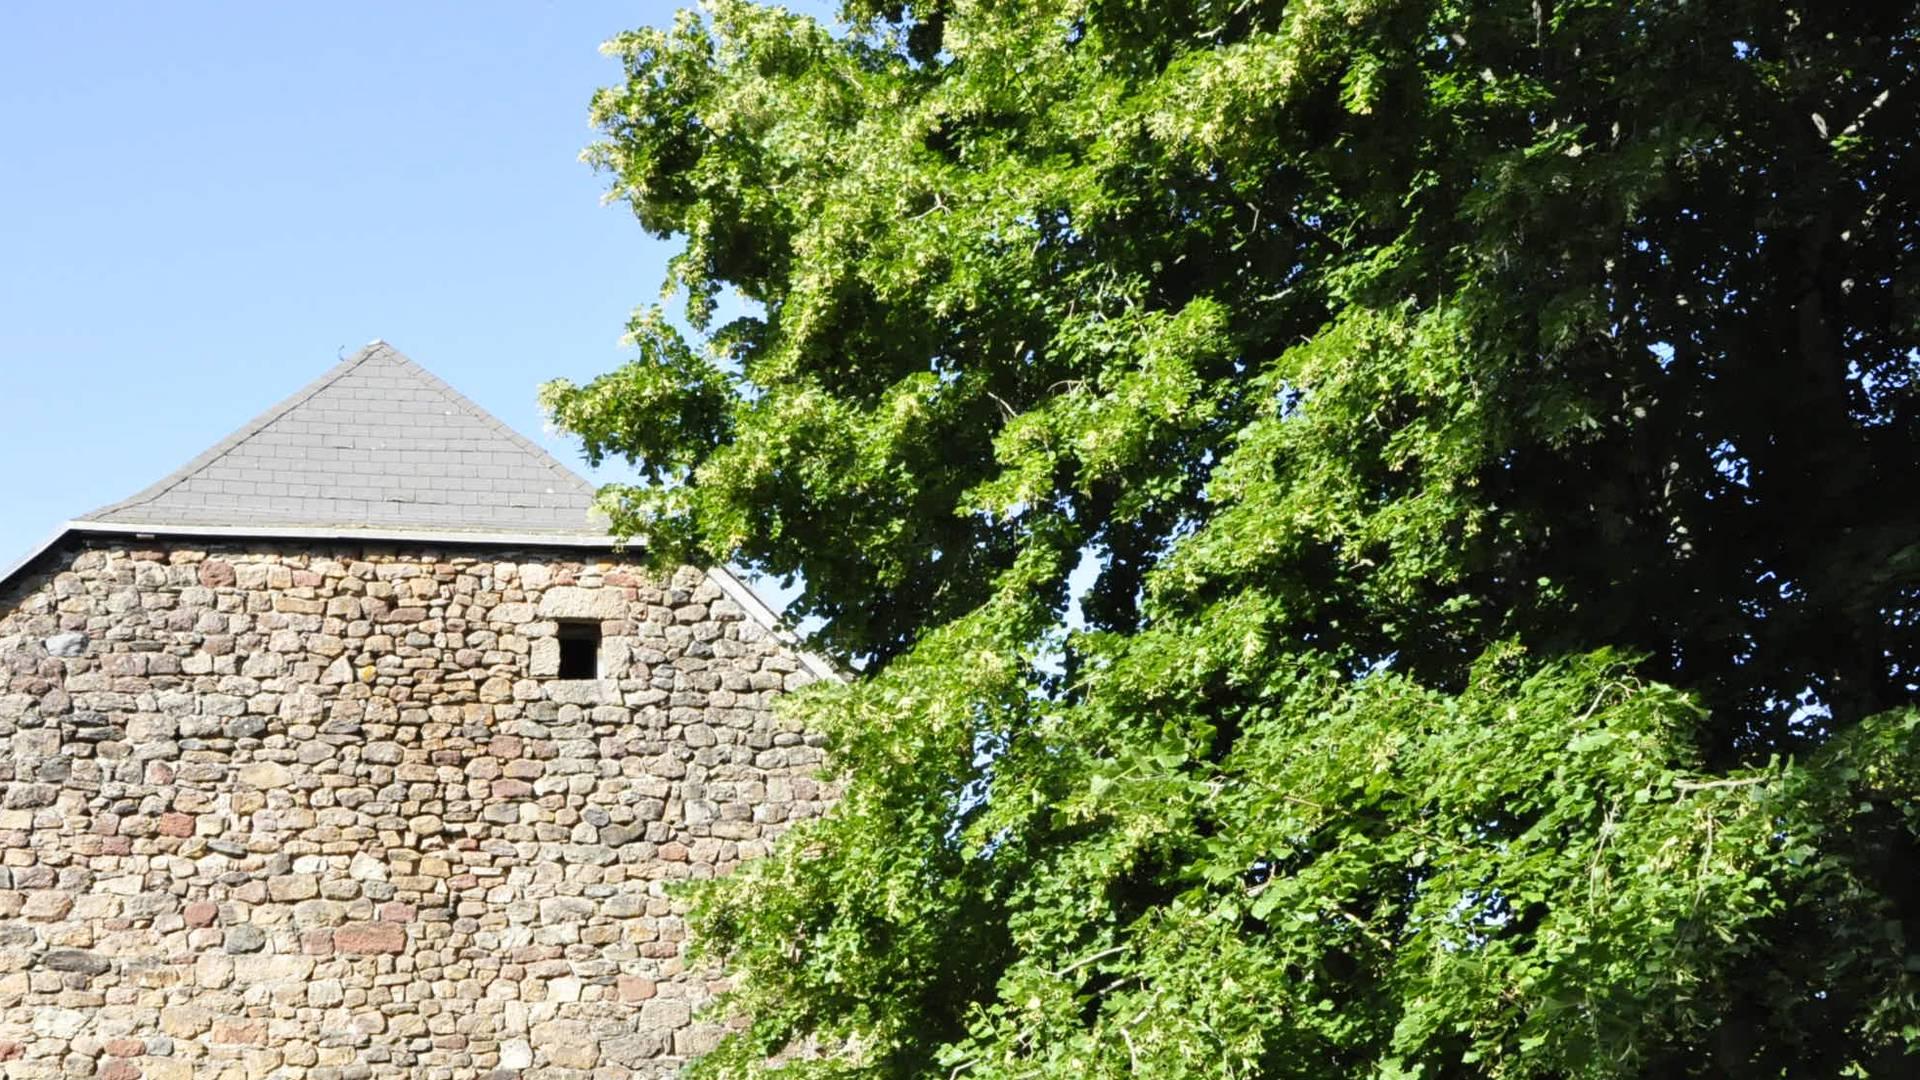 Tilleul arbre de la Vallée du Lot